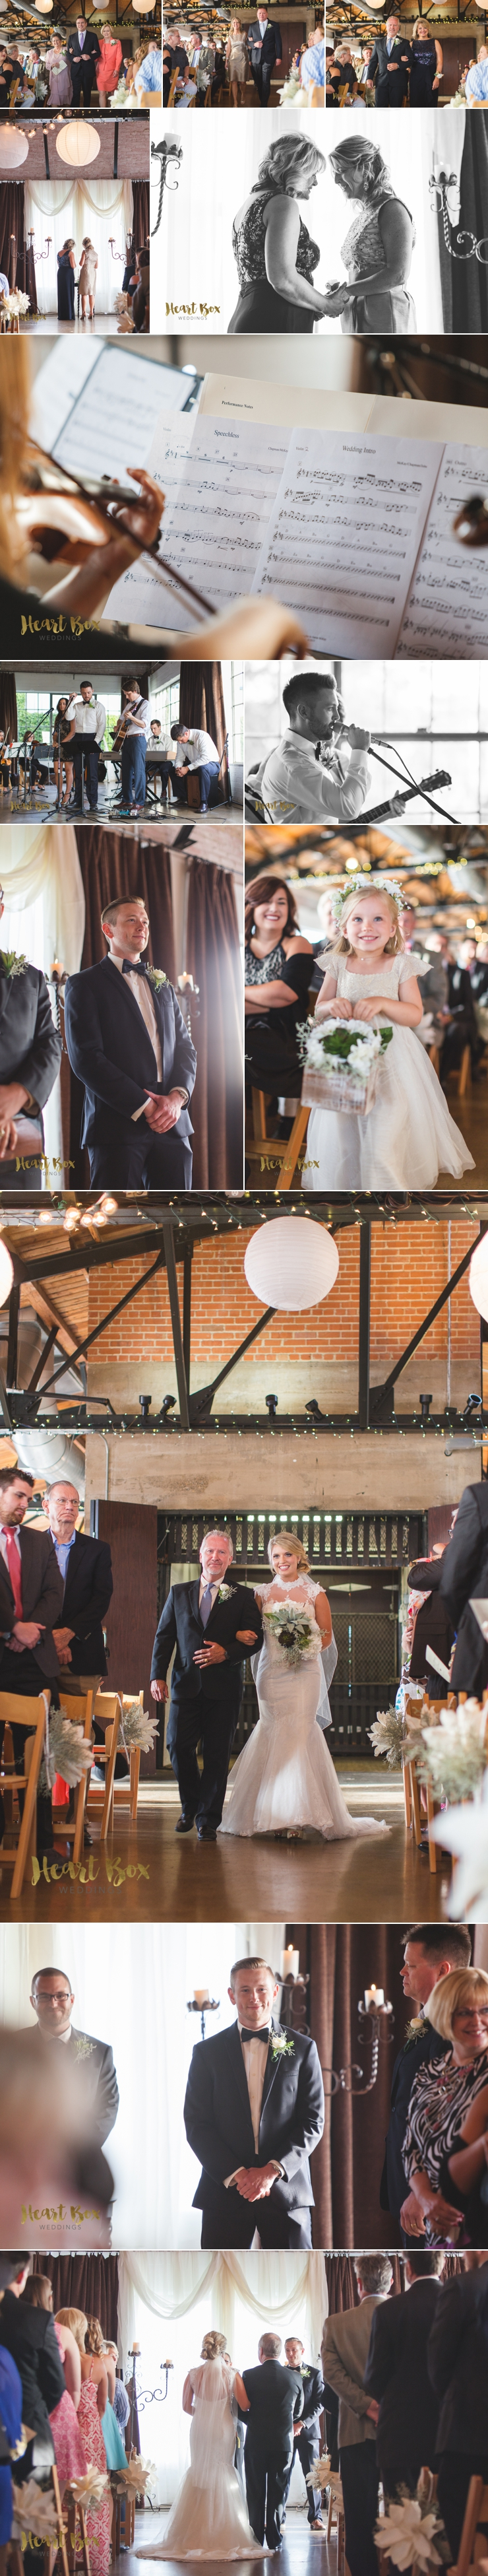 Mabry Wedding 15.jpg